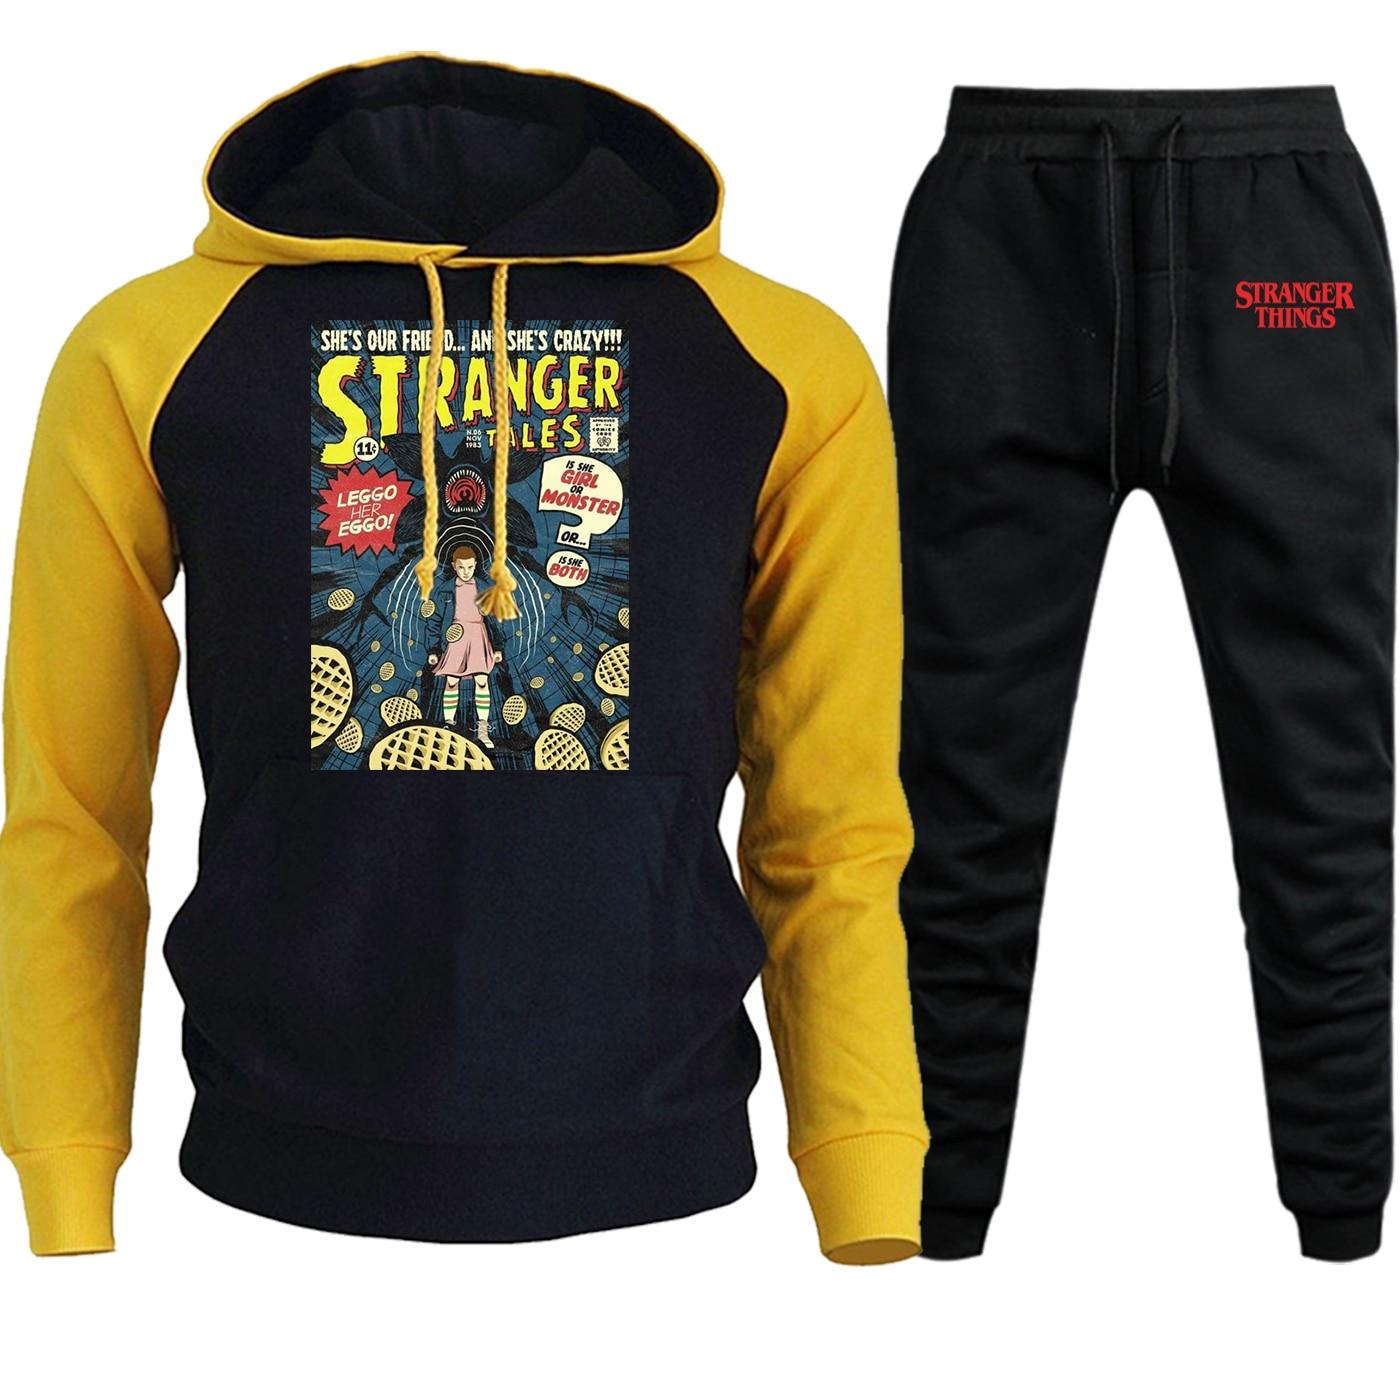 Men Hoodie Raglan Sweatshirts Stranger Things Autumn Winter New 2019 Casual Pullover Hip Hop Suit Fleece Hoody+Pants 2 Piece Set